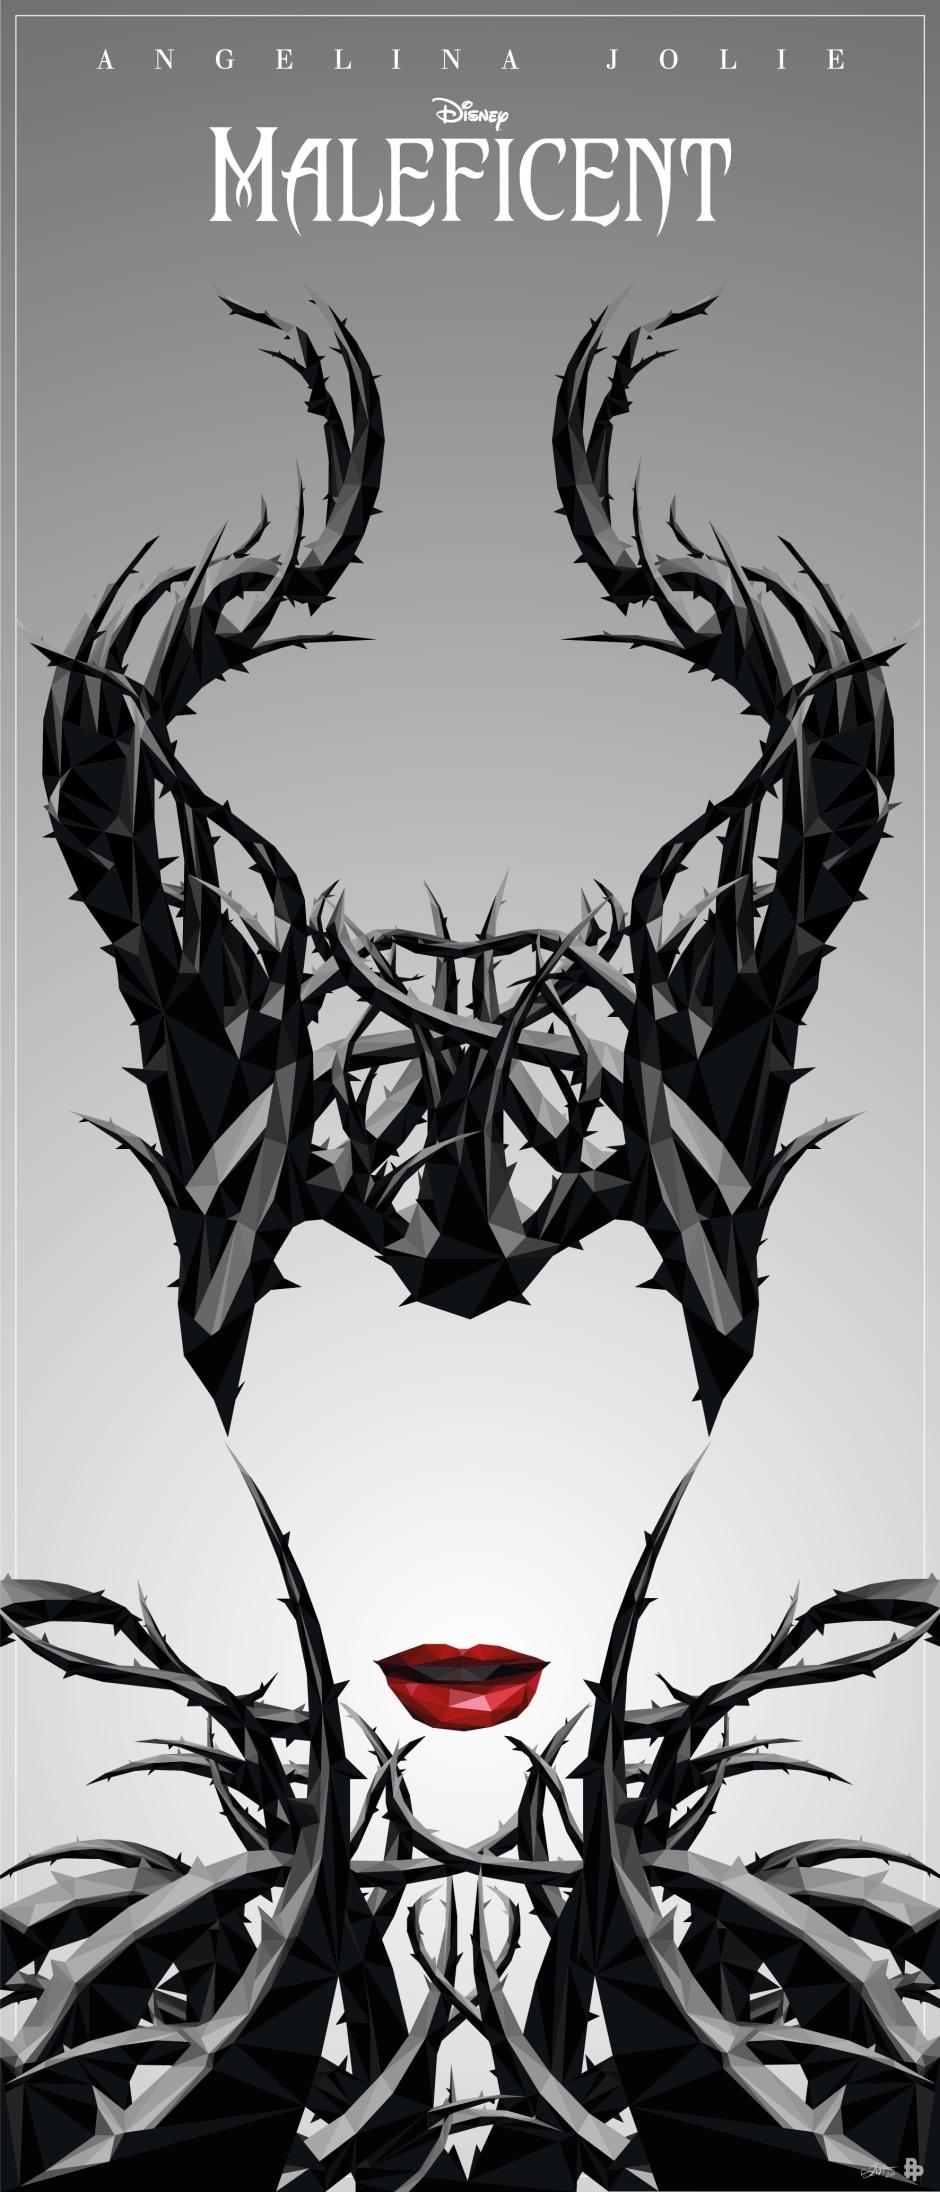 s2lart_Maleficent_3-01